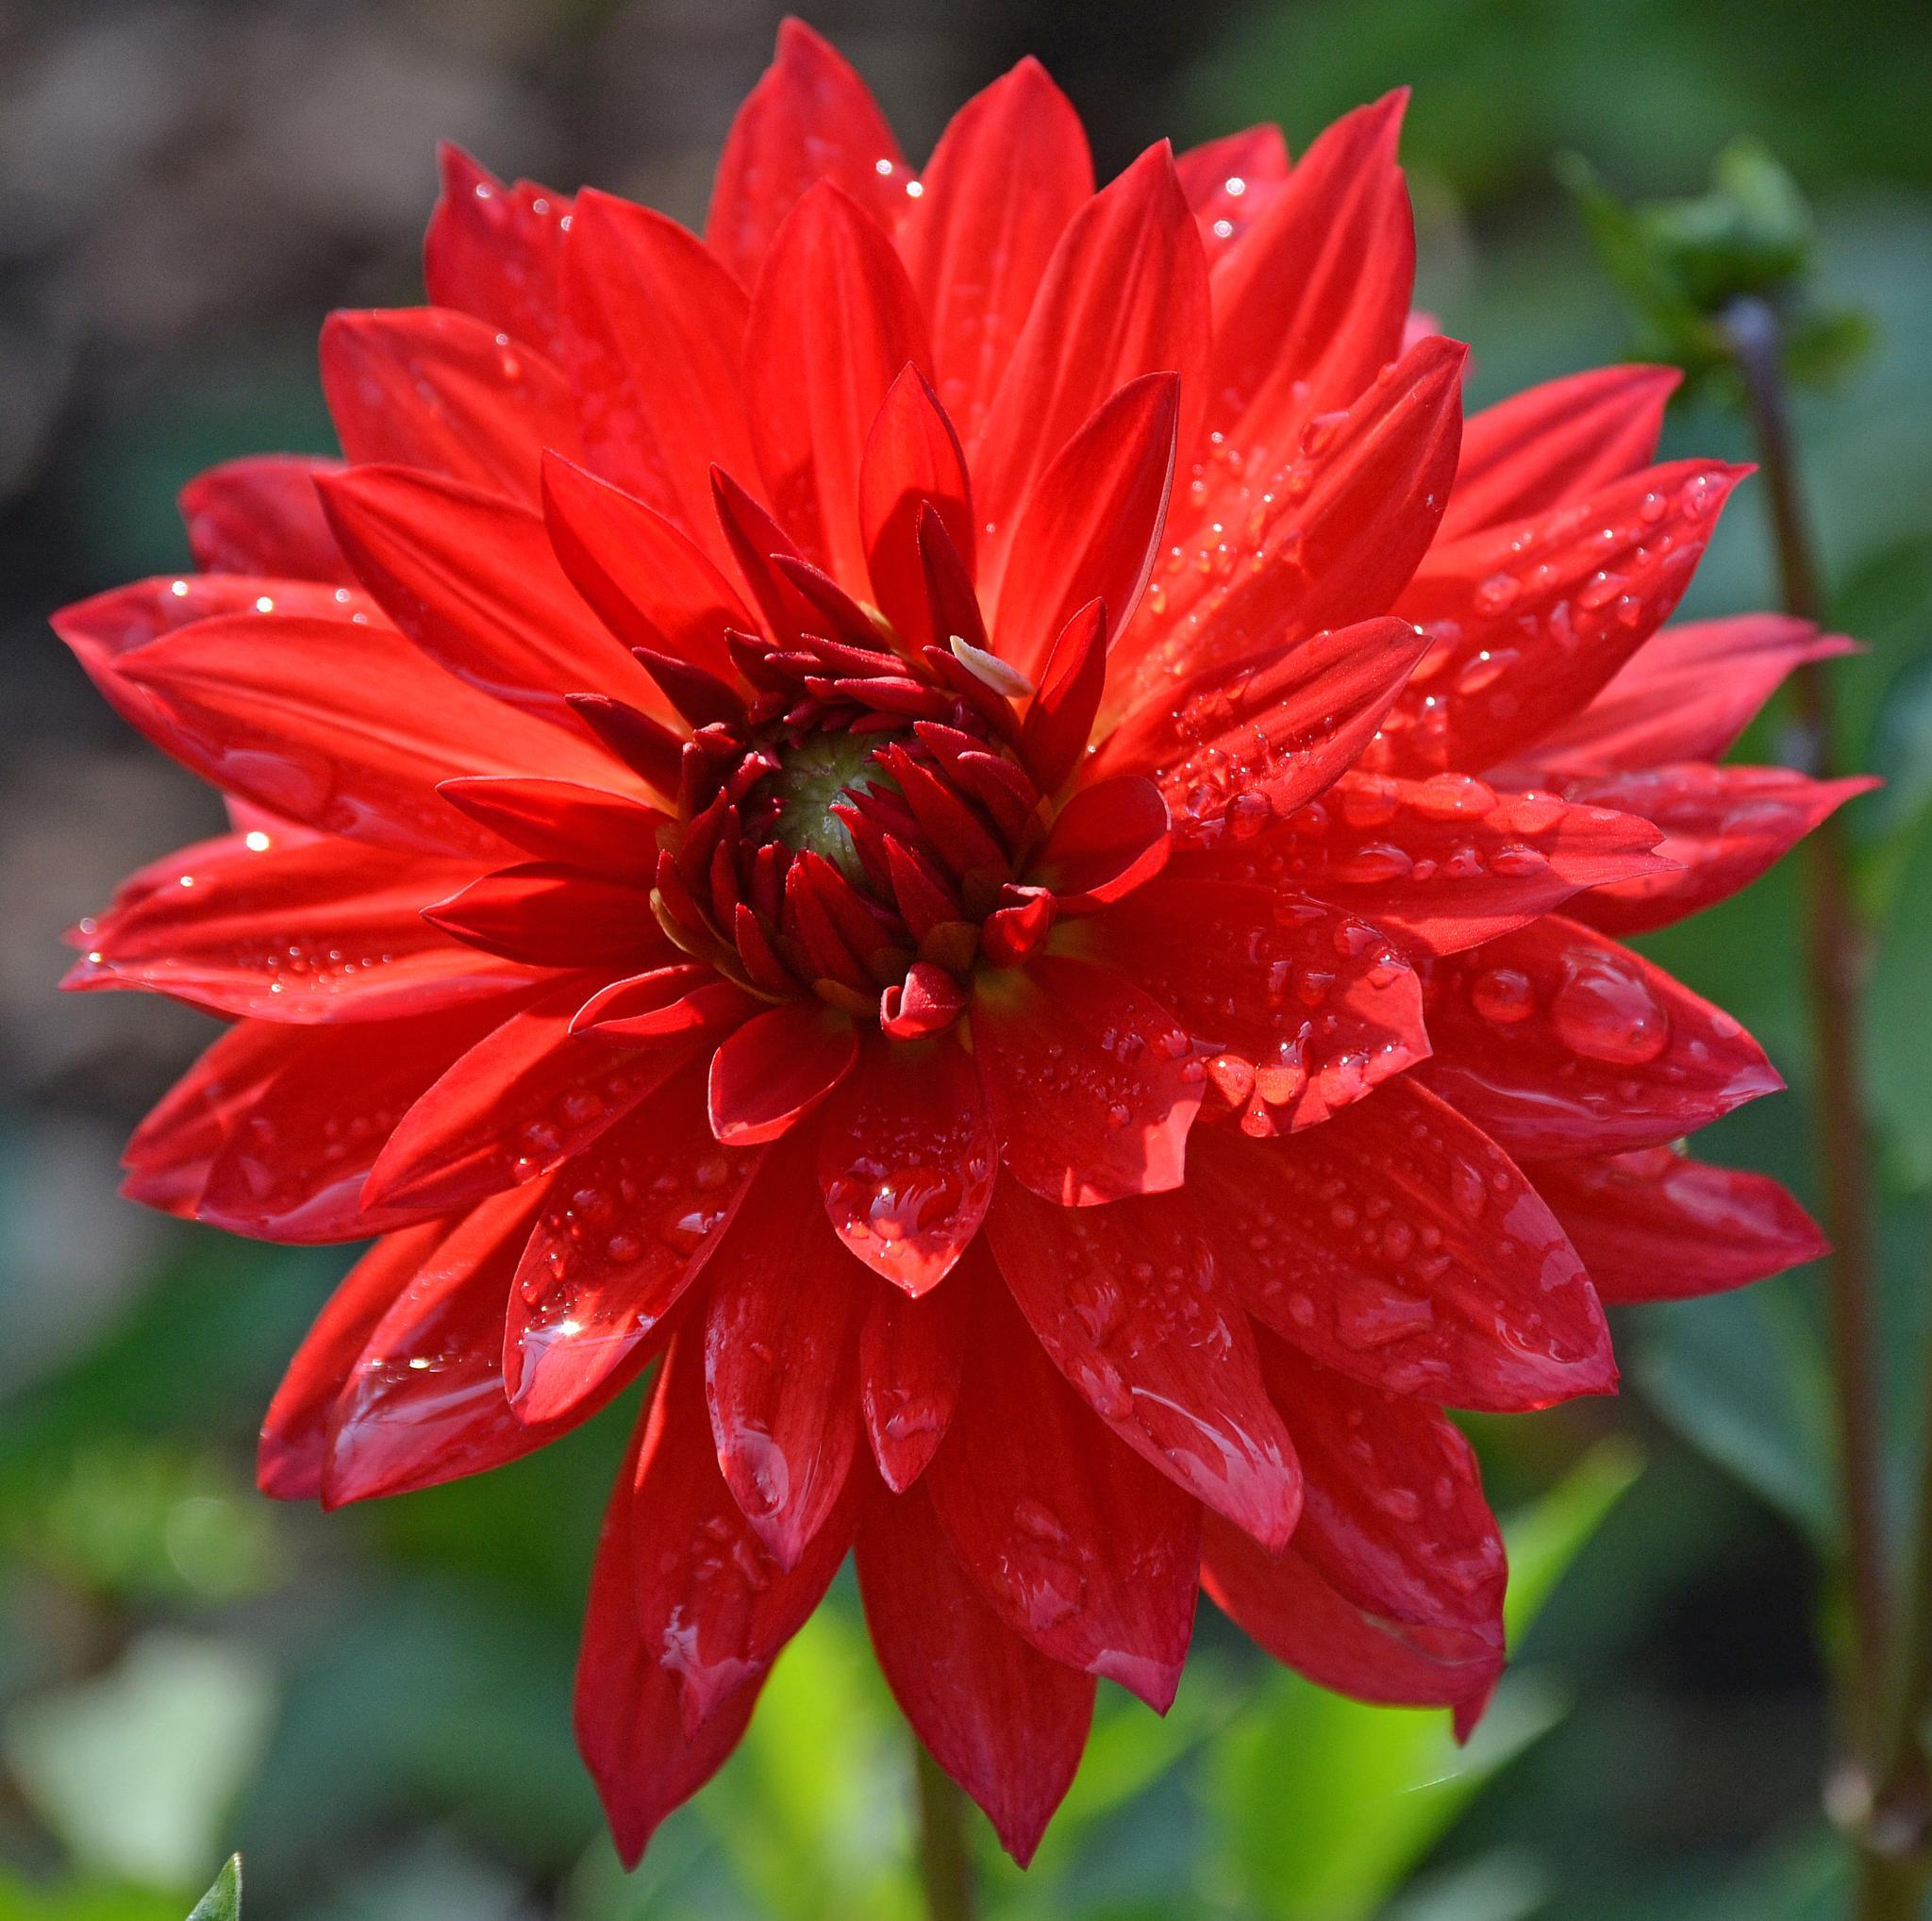 Red Flower by Annie Huber